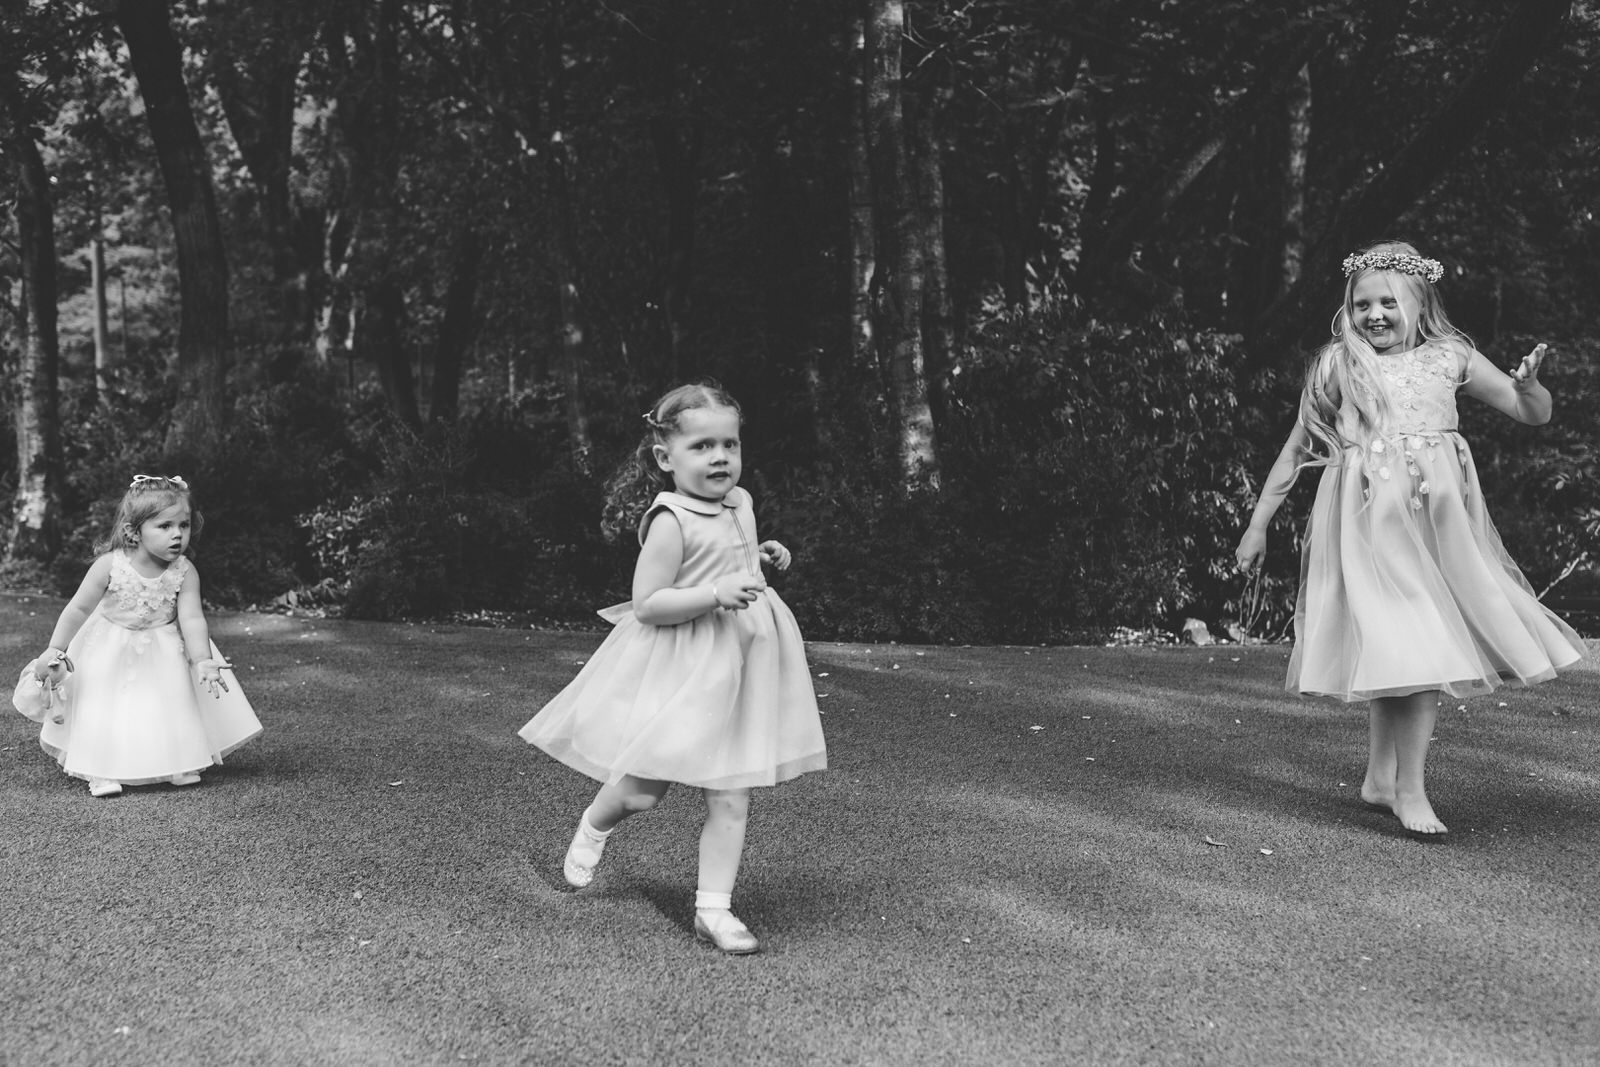 Moddershall-Oaks-Spa-Wedding-Photographer-058.jpg